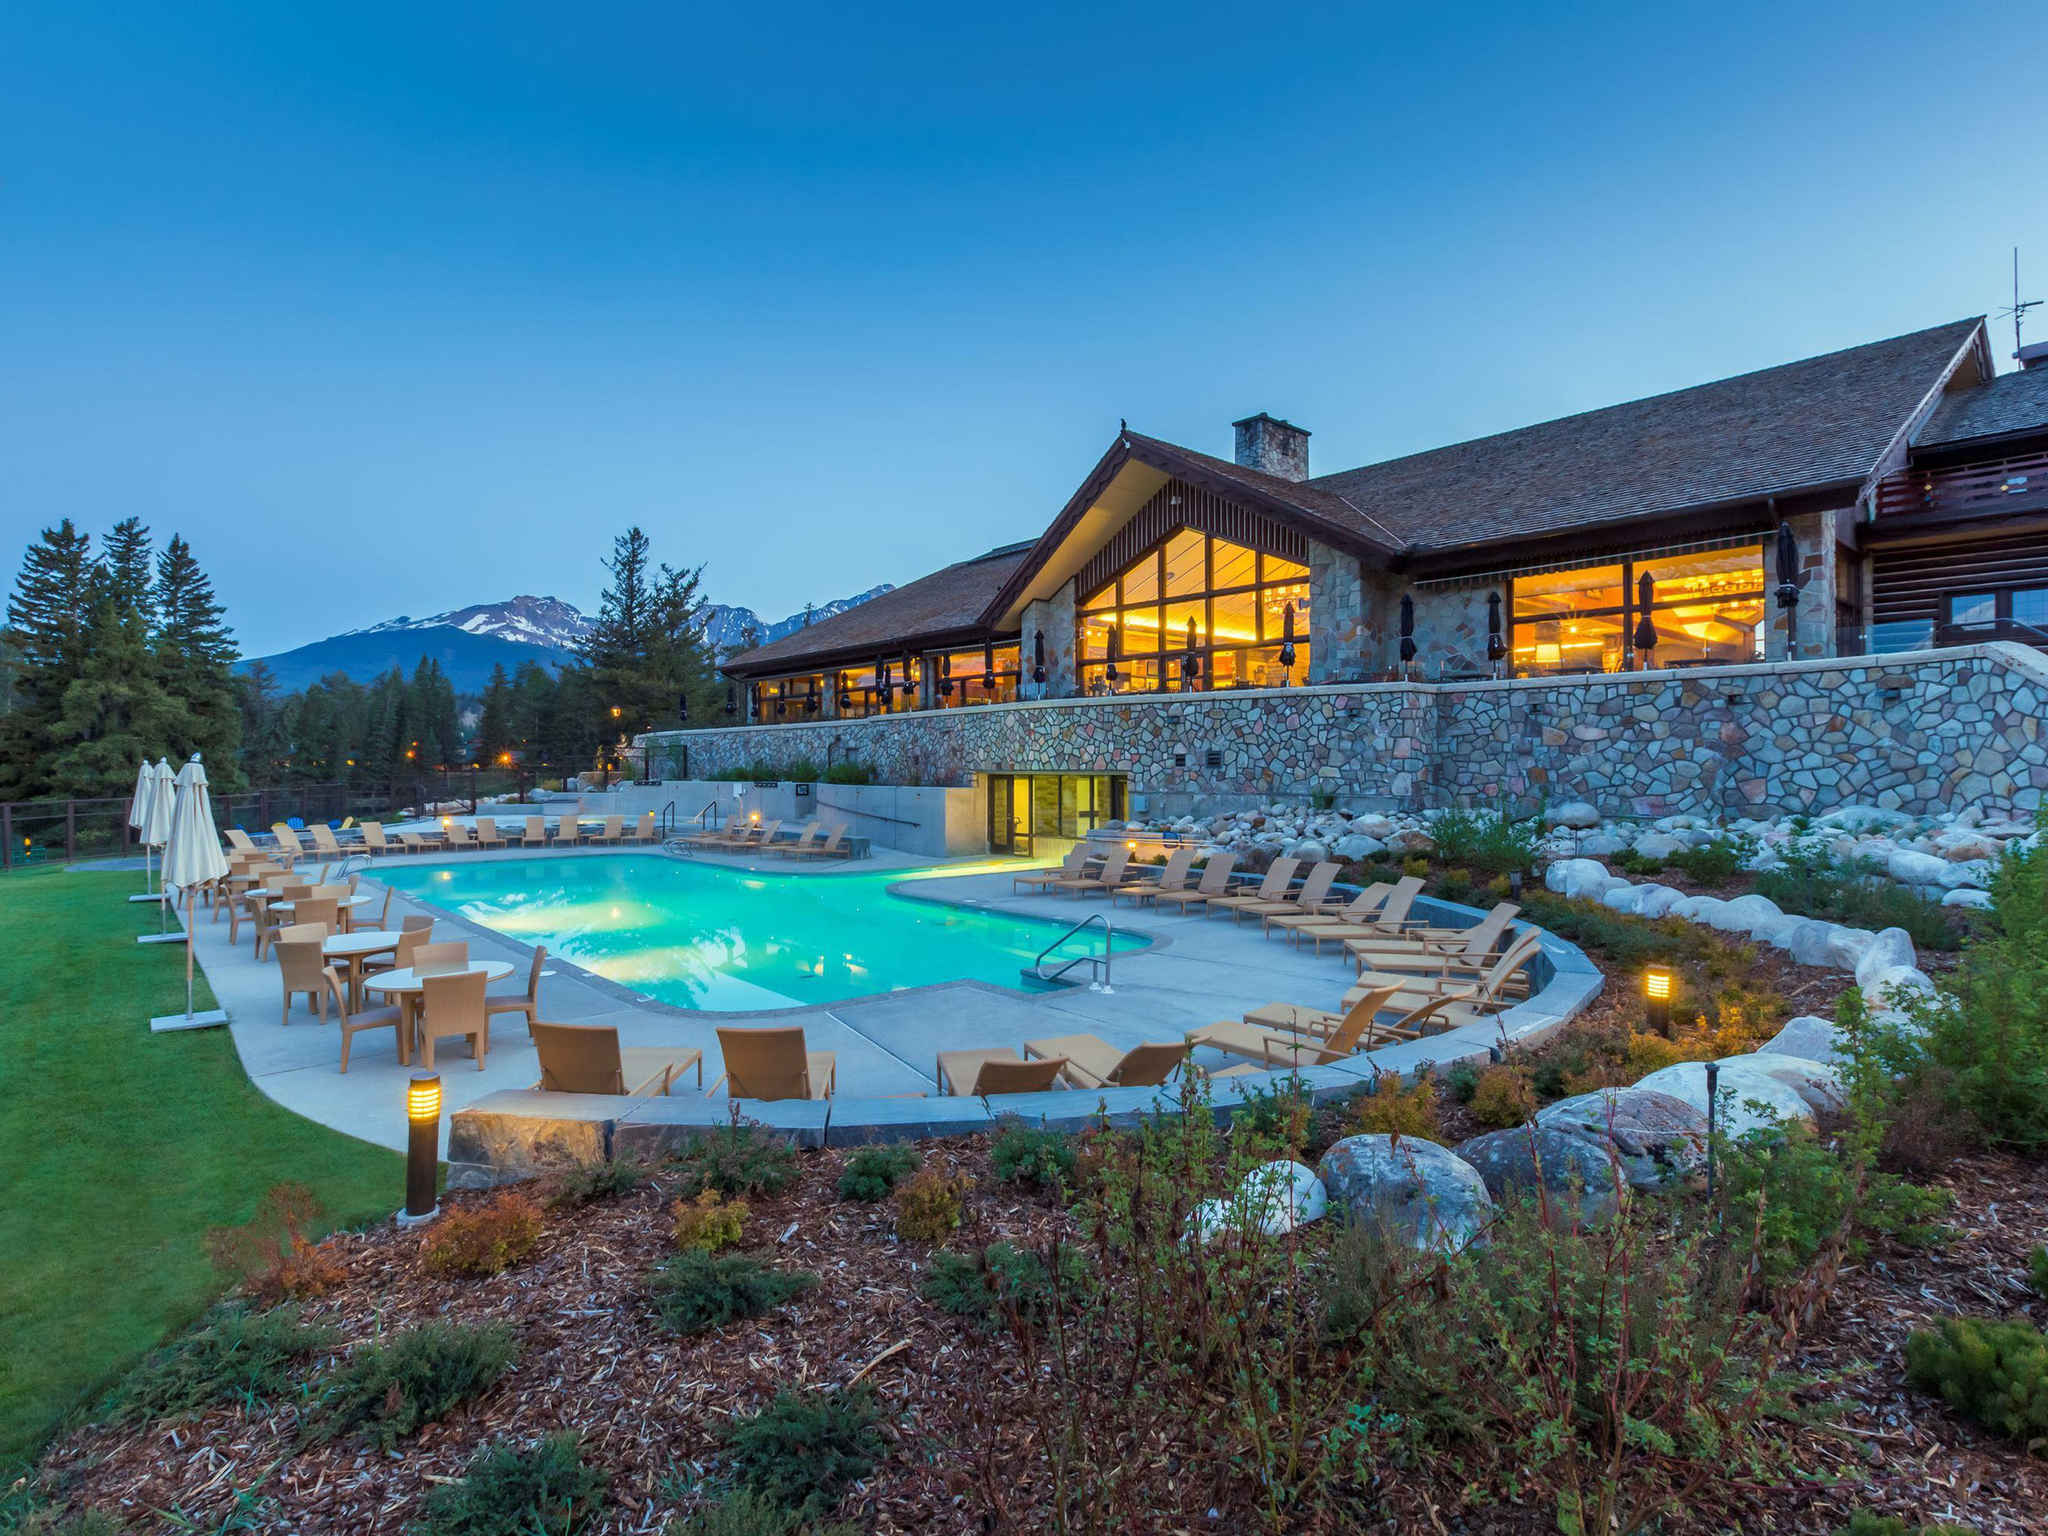 Hotel in jasper   Fairmont Jasper Park Lodge 2048x1536